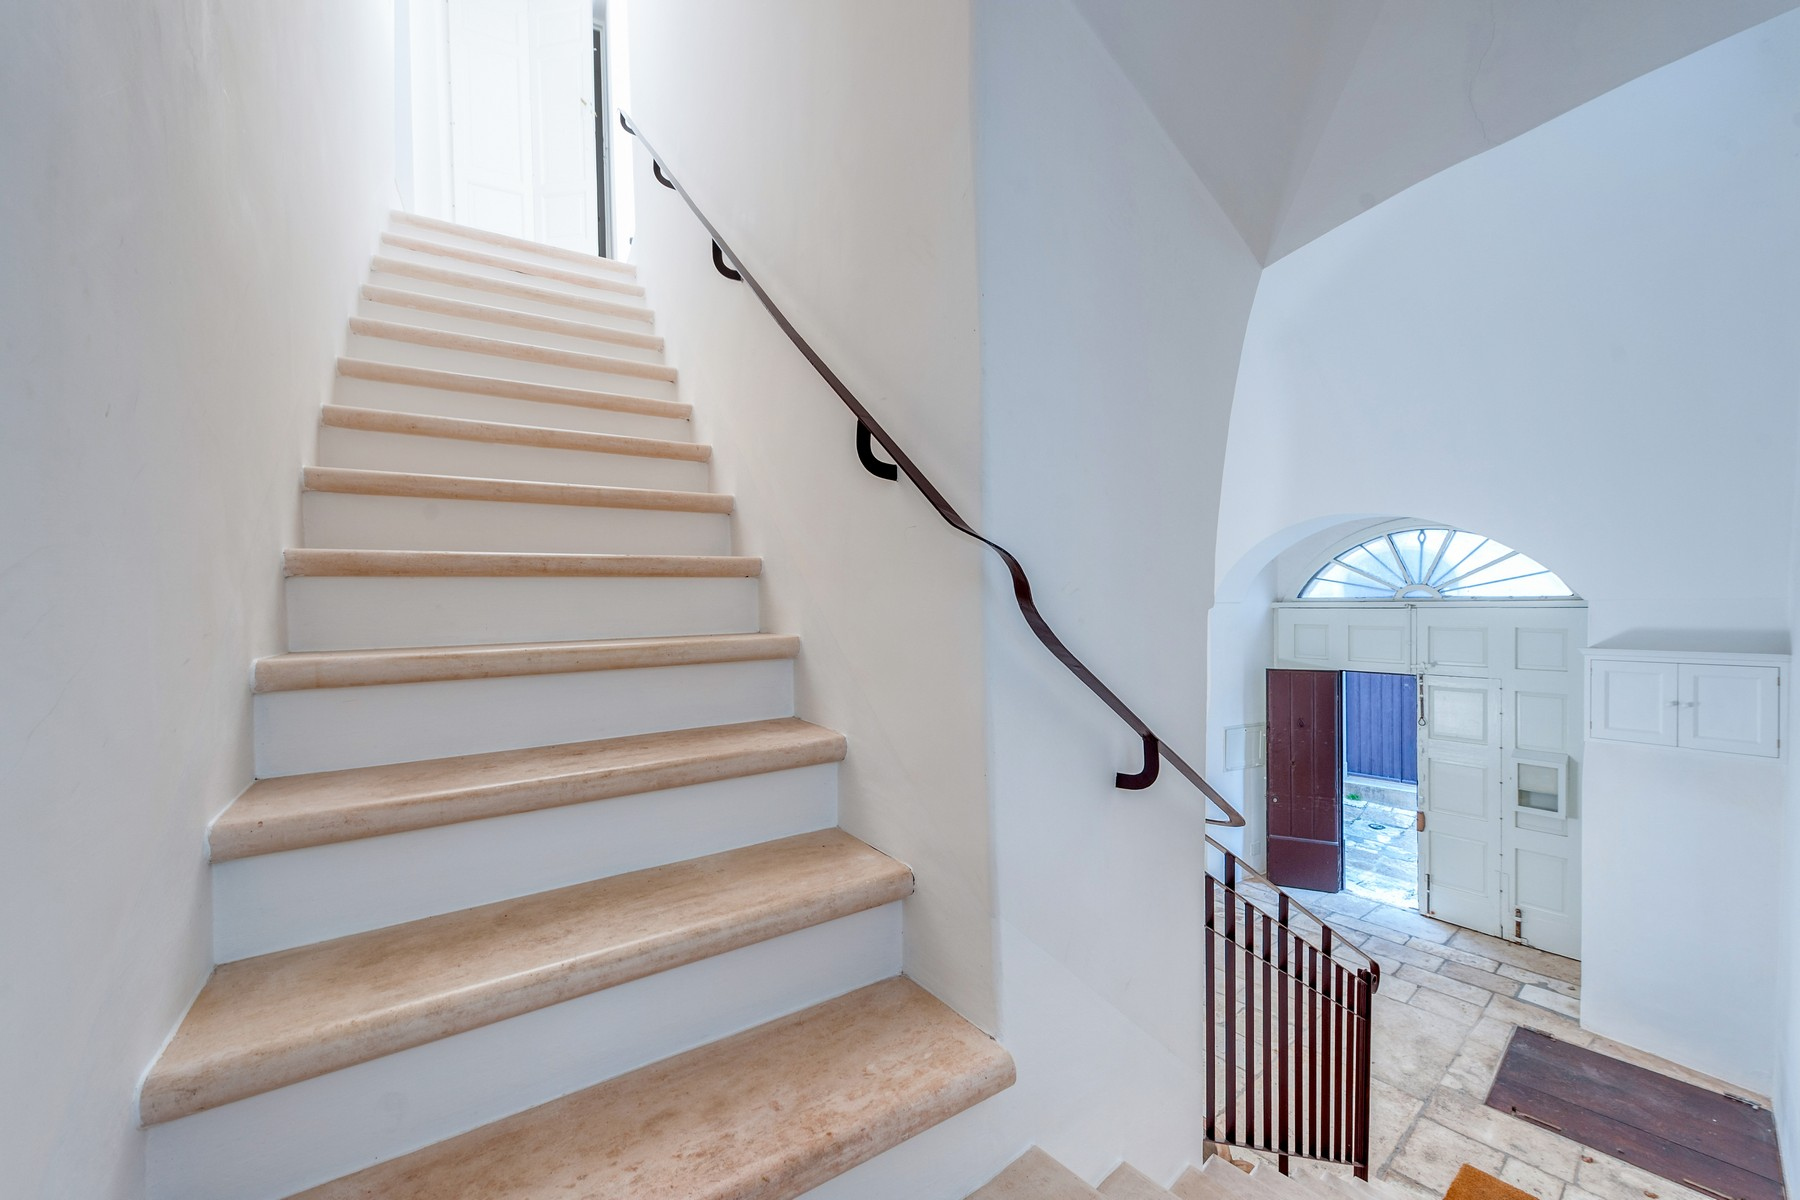 Appartamento in Vendita a Ostuni: 5 locali, 265 mq - Foto 15